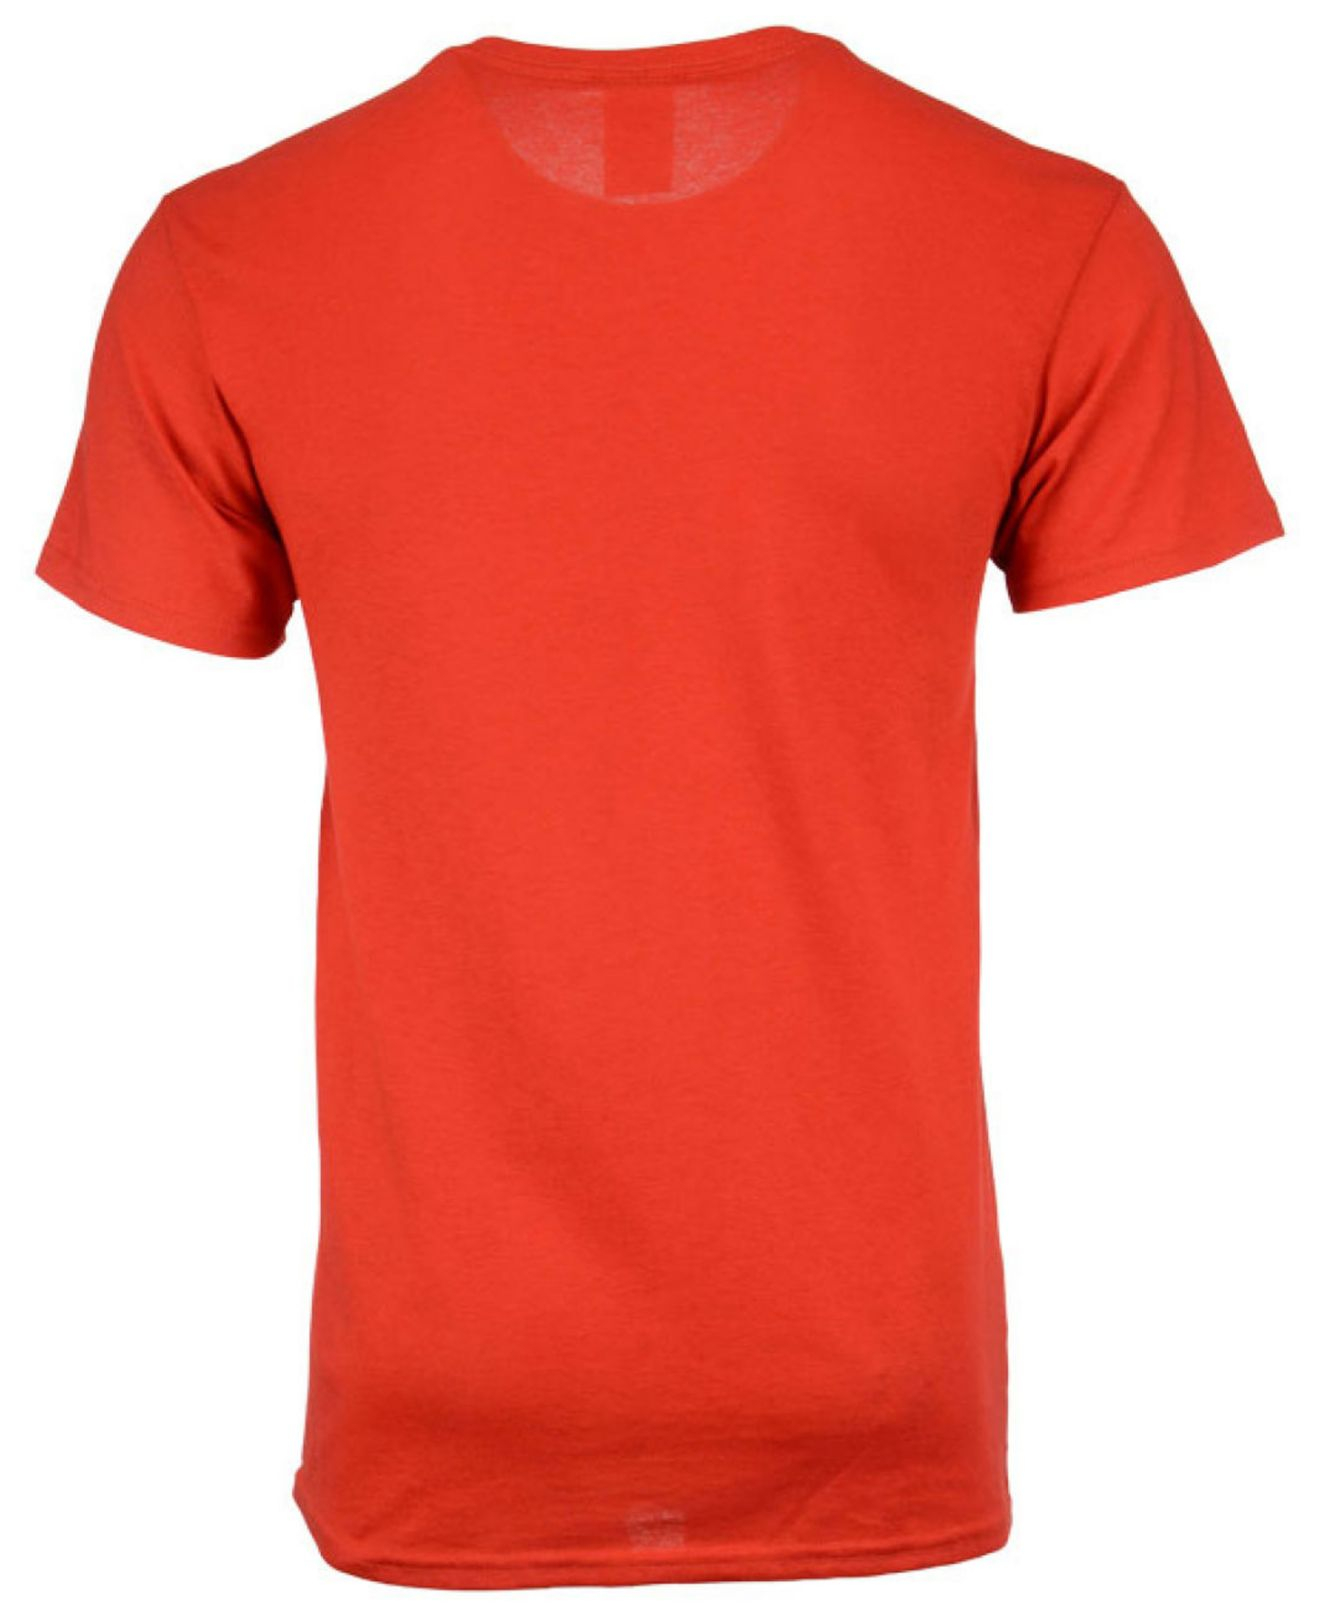 Lyst j america men 39 s louisville cardinals basketball t for Louisville t shirt printing